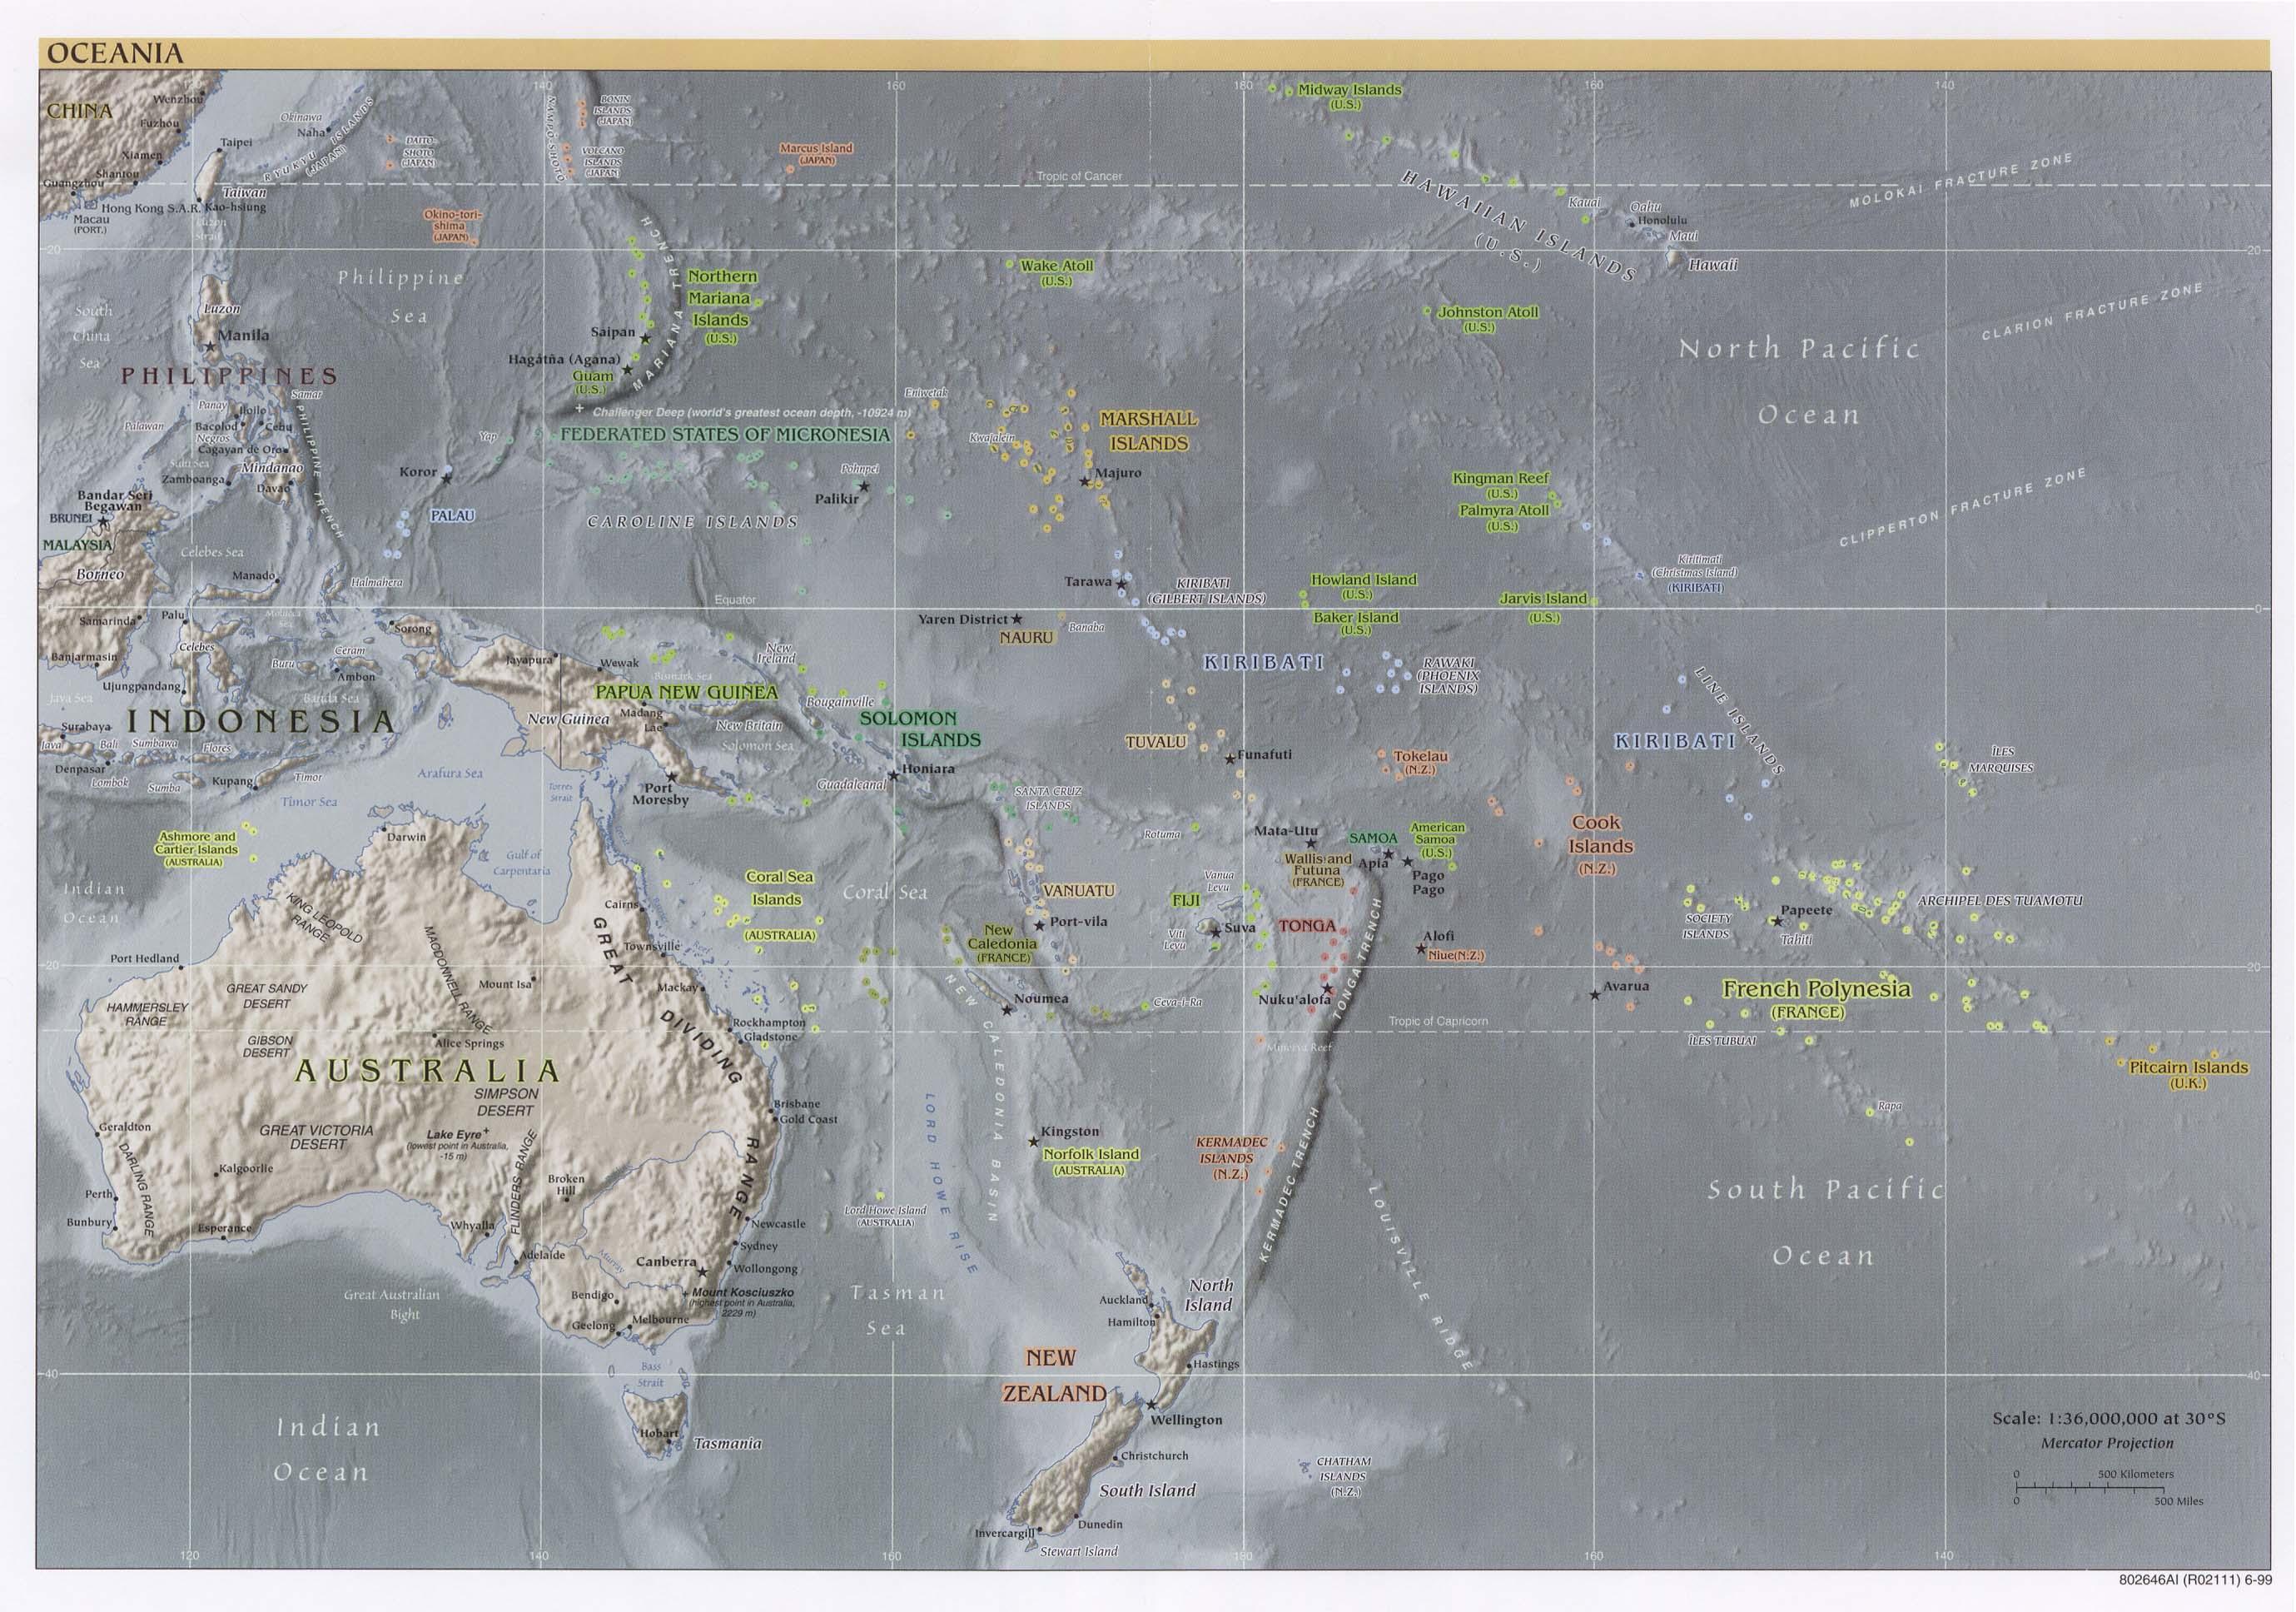 Oceania physical map 1999